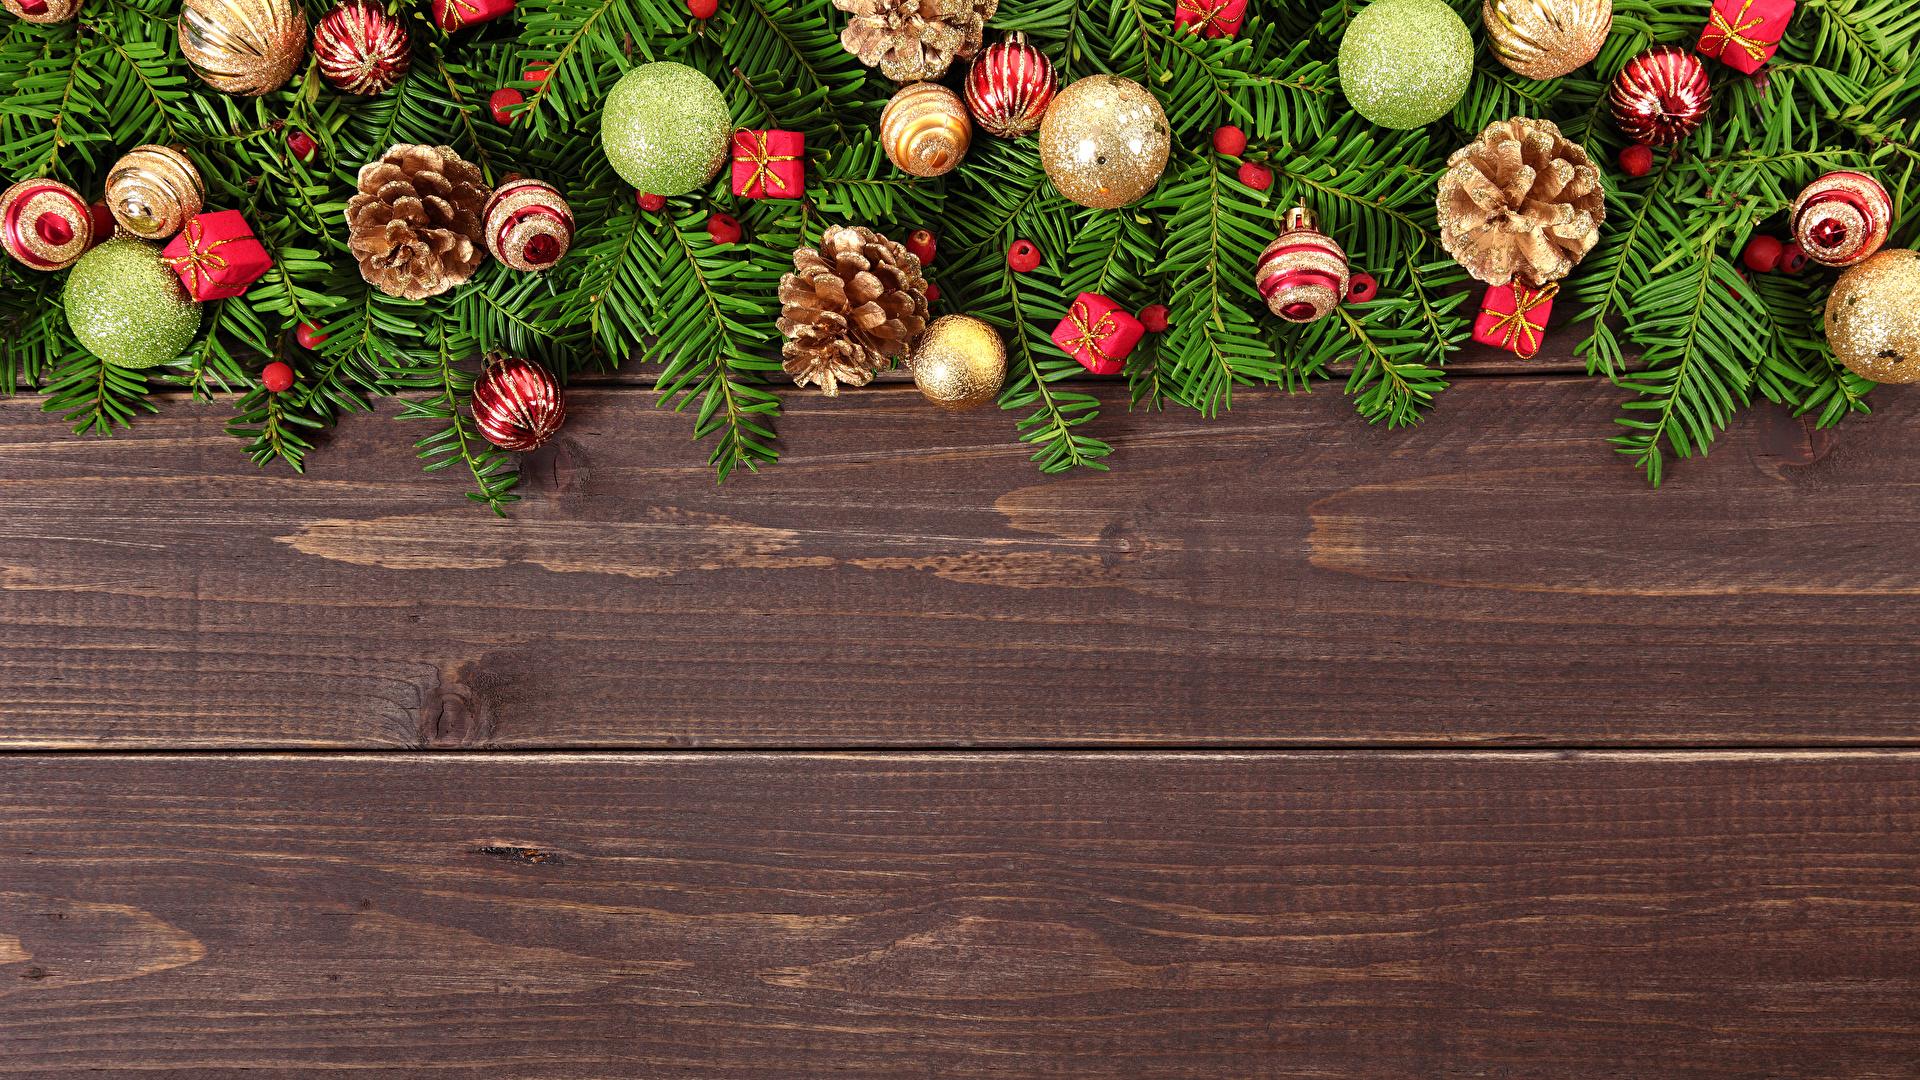 Картинка Рождество Шар шишка Доски 1920x1080 Новый год Шишки Шарики